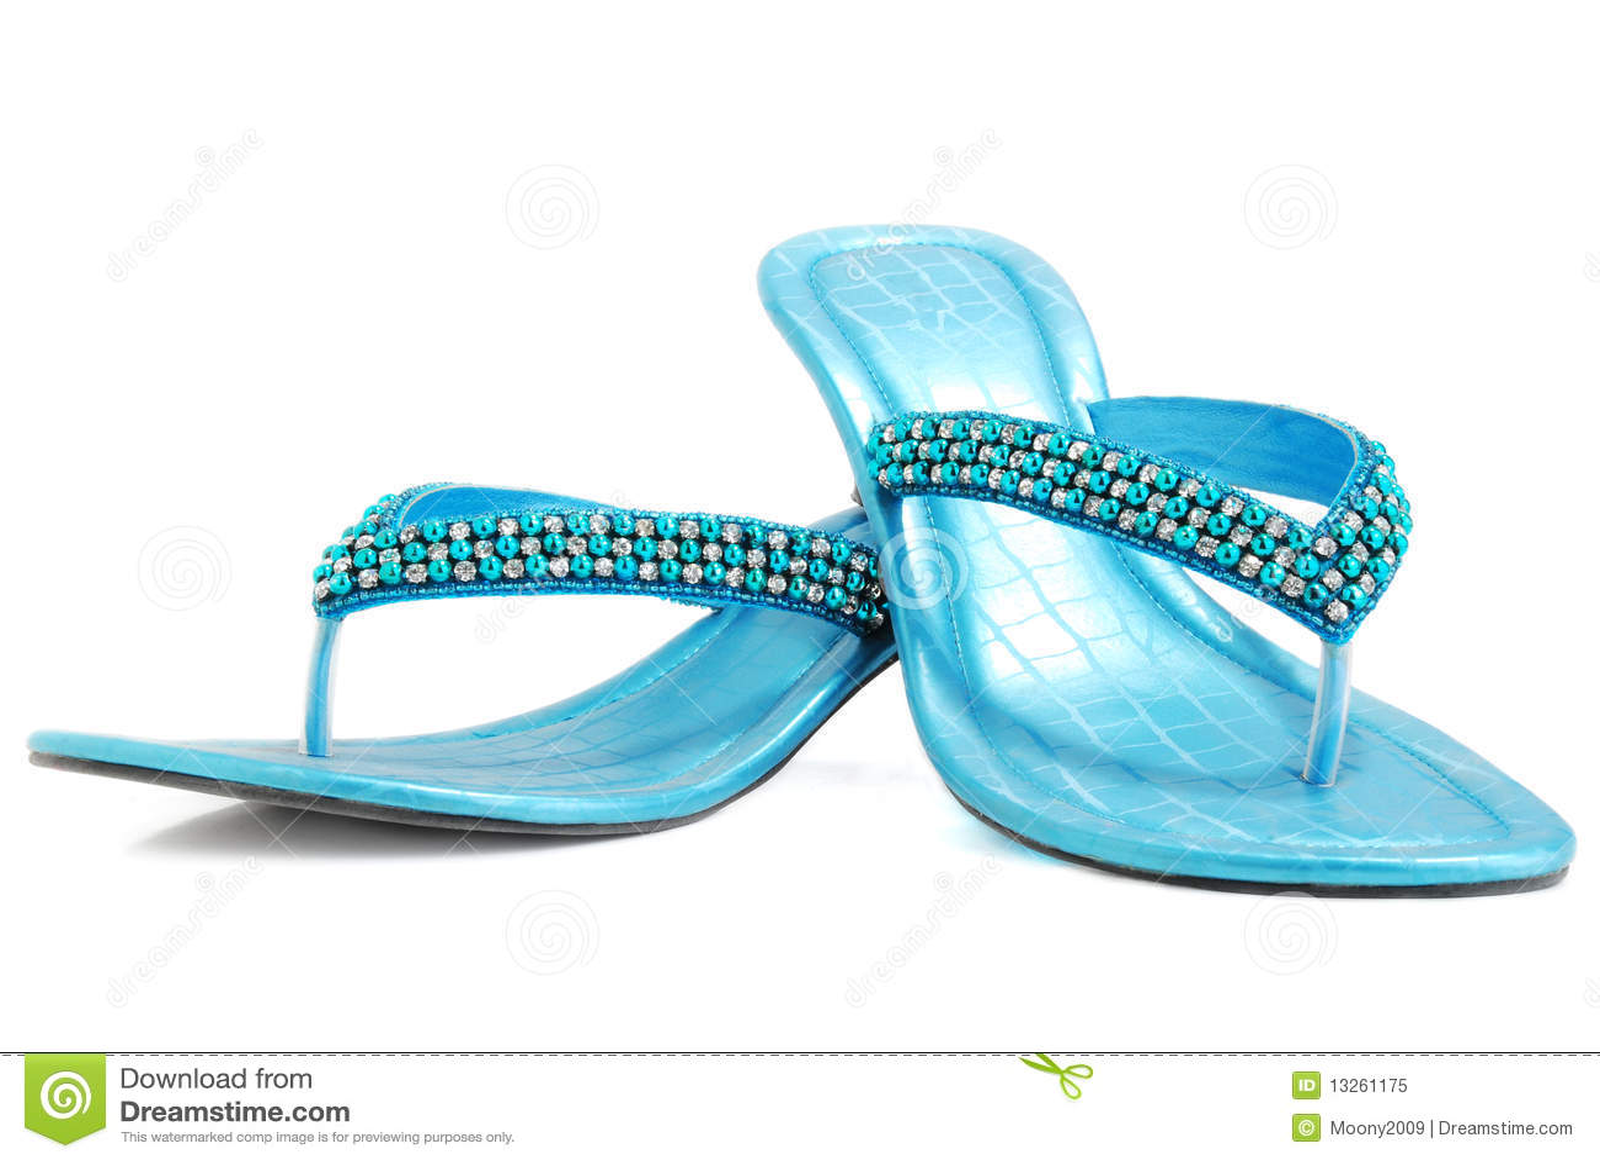 Mens Fancy Boots Images Decorating Ideas Shoes Size